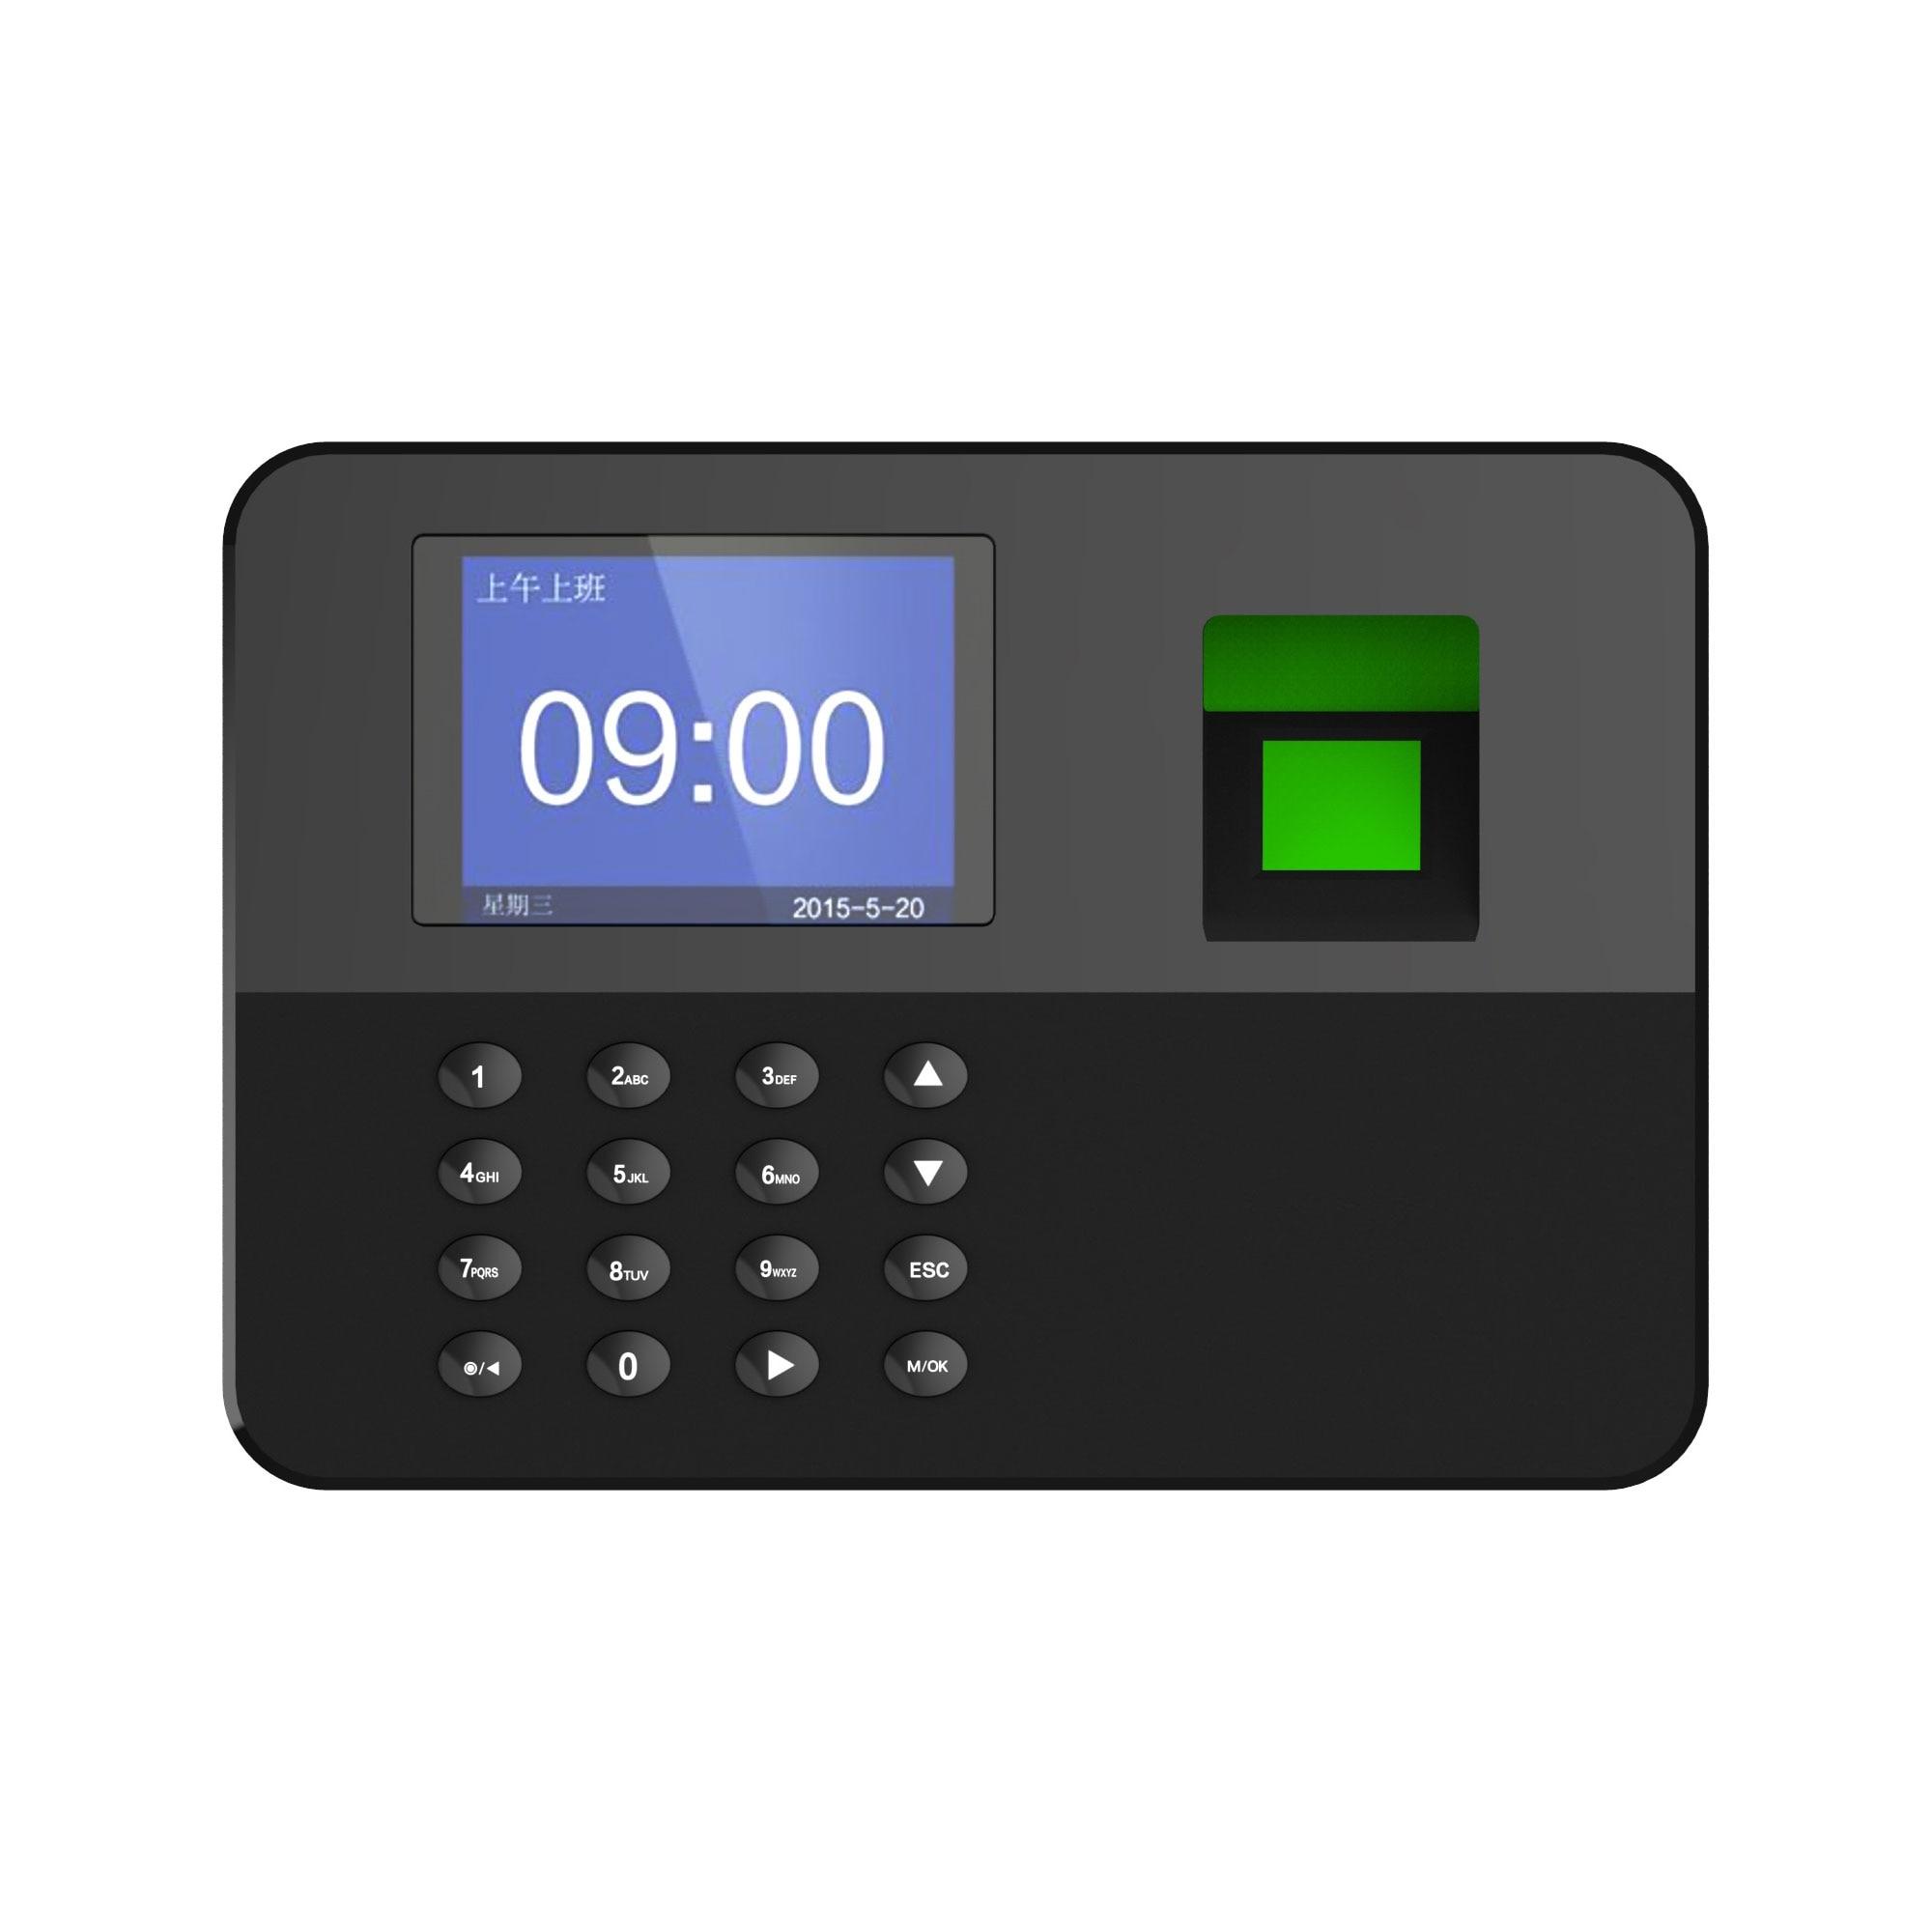 NETUM ביומטרי טביעת אצבע סיסמא נוכחות מכונה עם 2.4 אינץ LCD מסך ניהול עובדים זמן שעון רב שפה